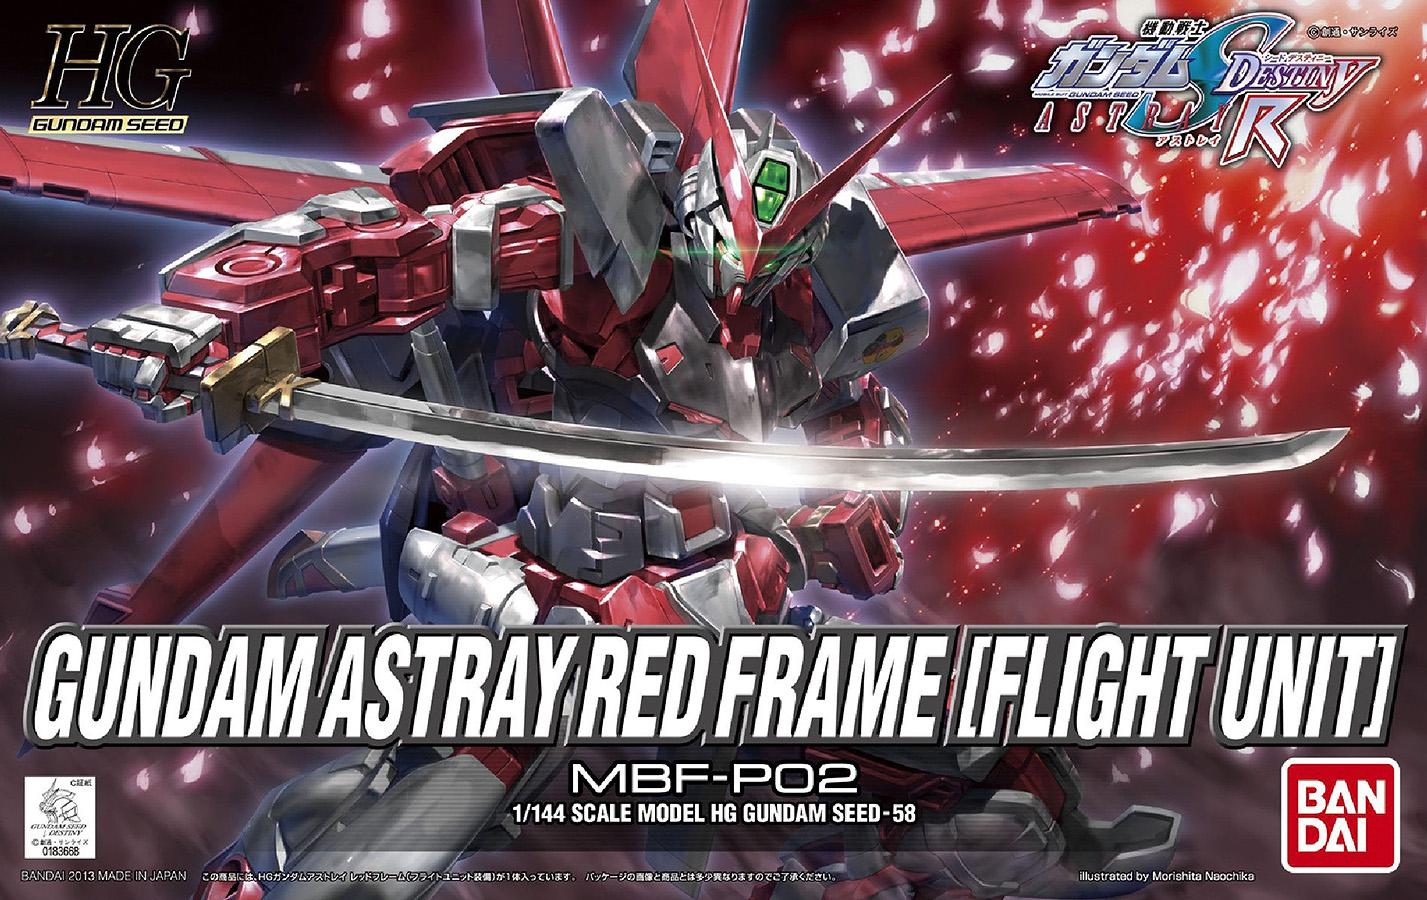 1/144 Gundam Astray Red Frame With Flight Unit